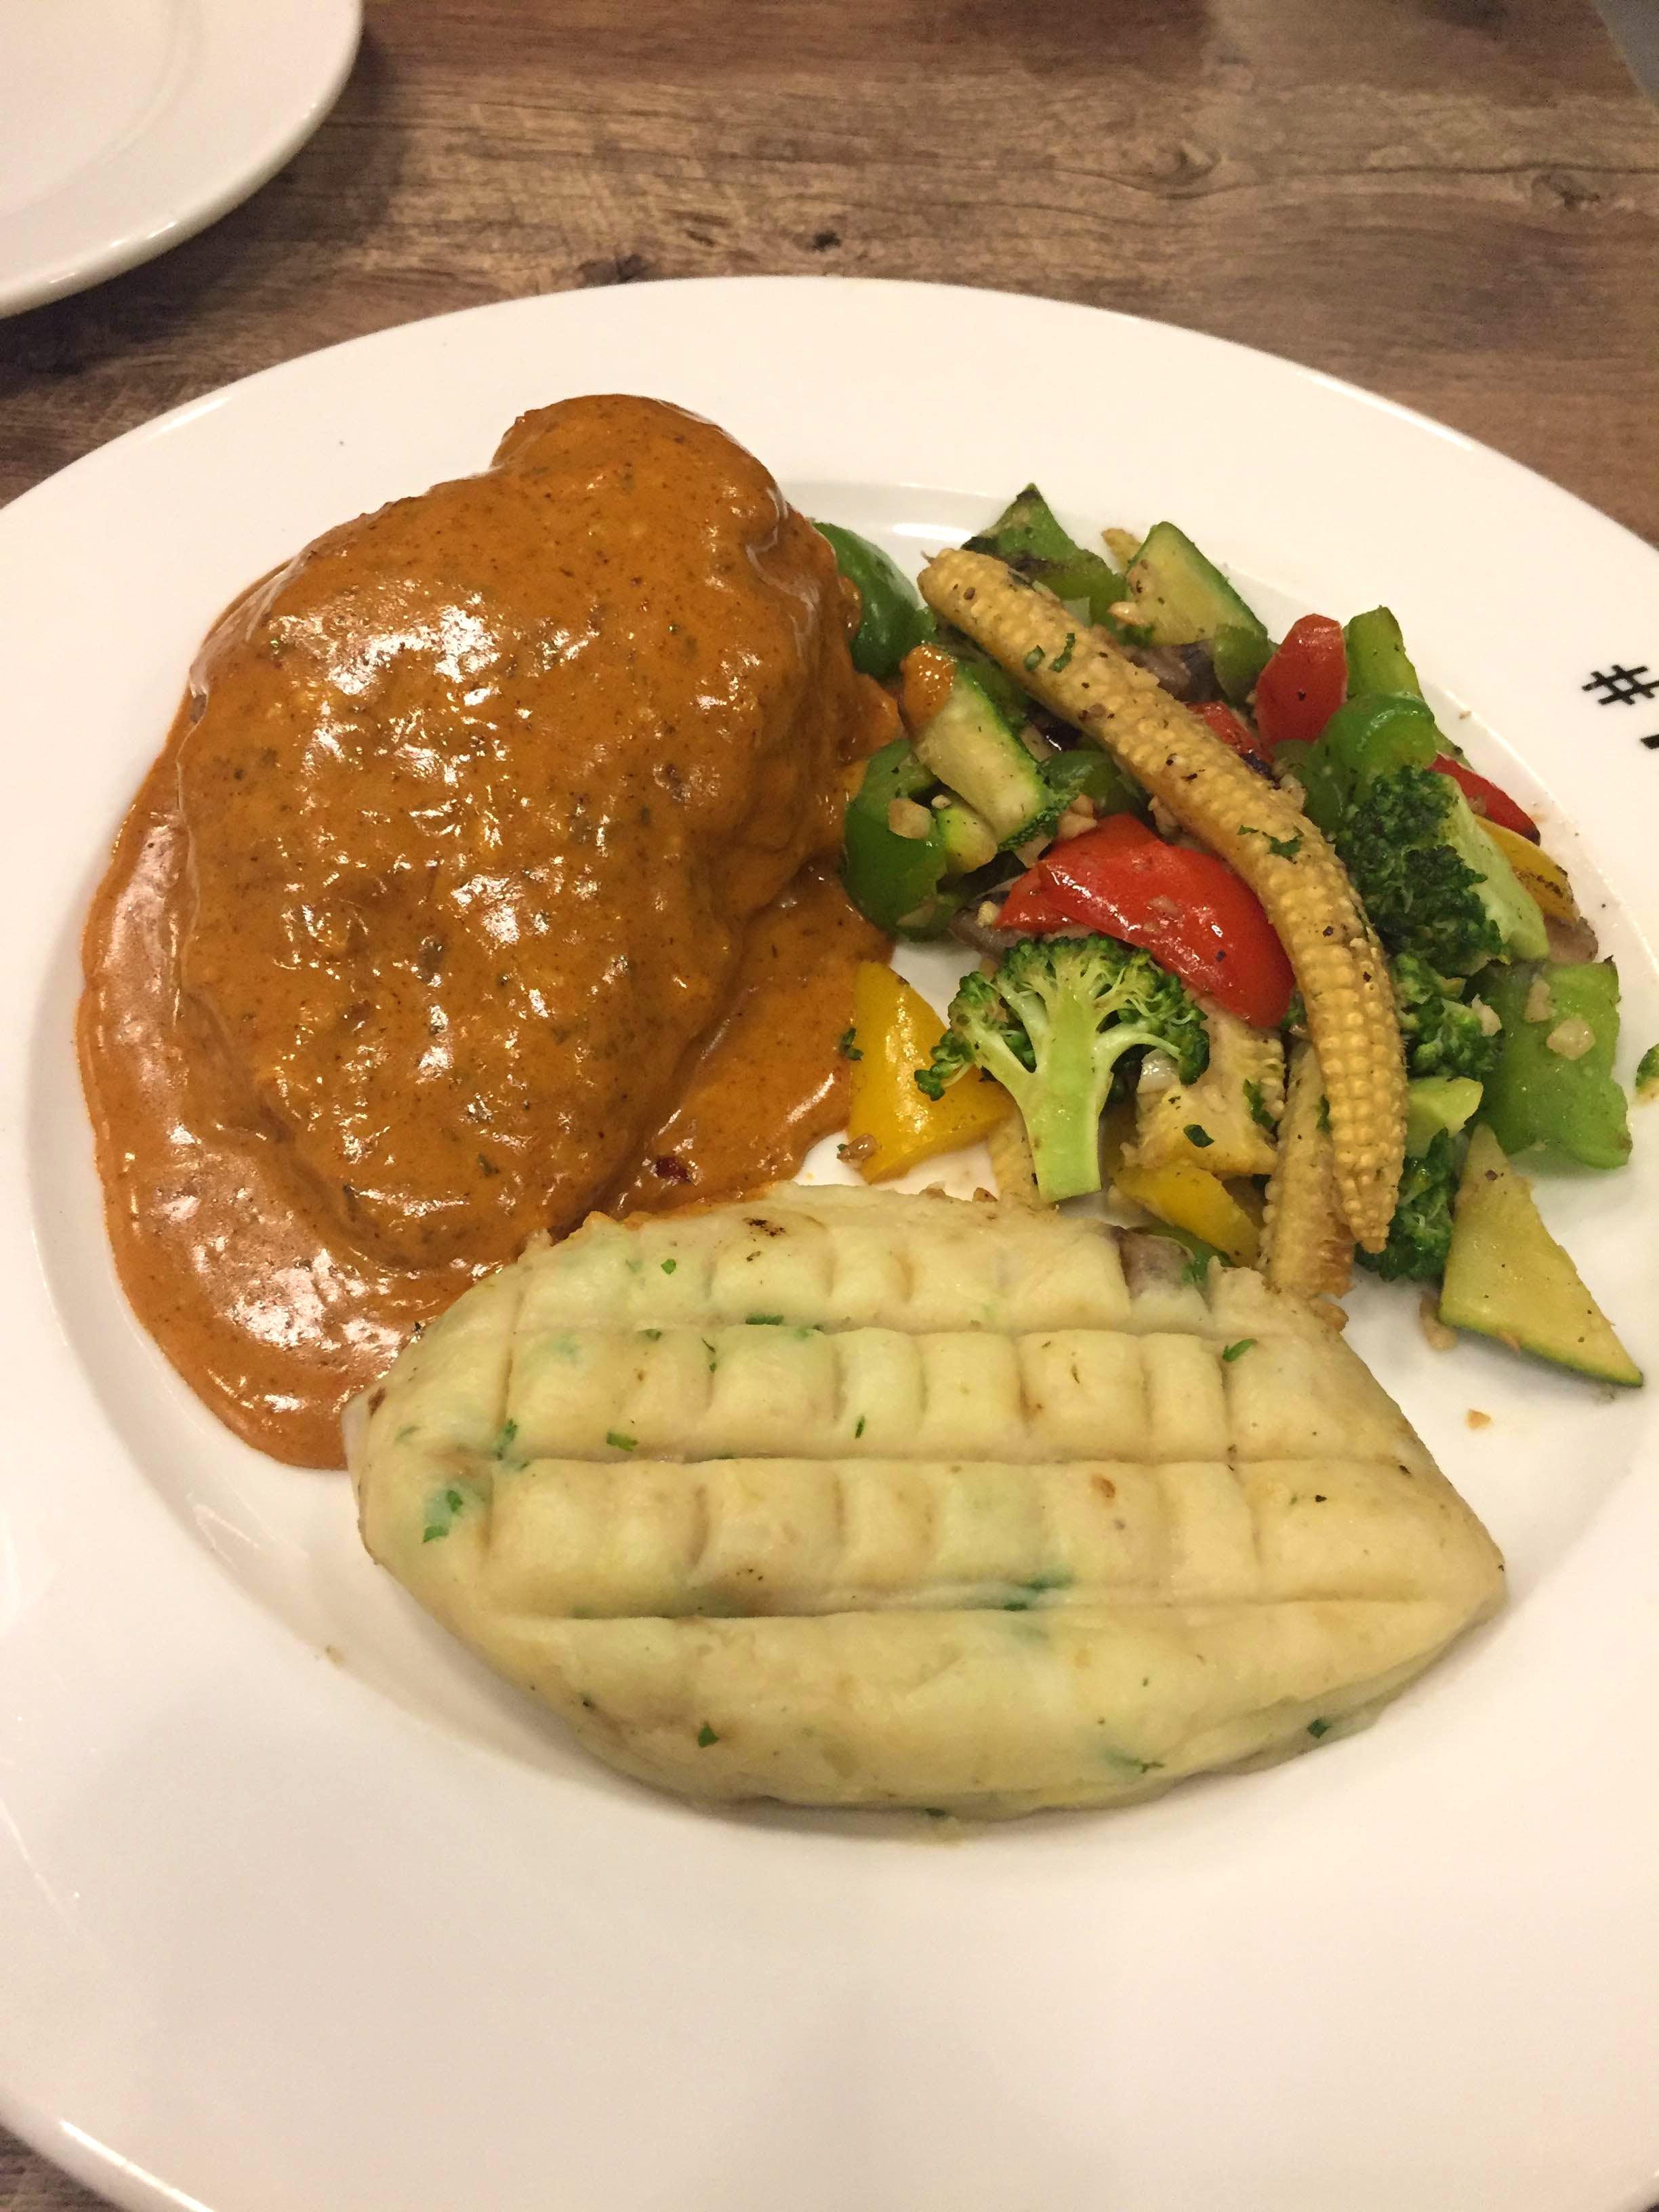 Dish,Food,Cuisine,Ingredient,Meal,Comfort food,Produce,Meat,Vegan nutrition,Recipe